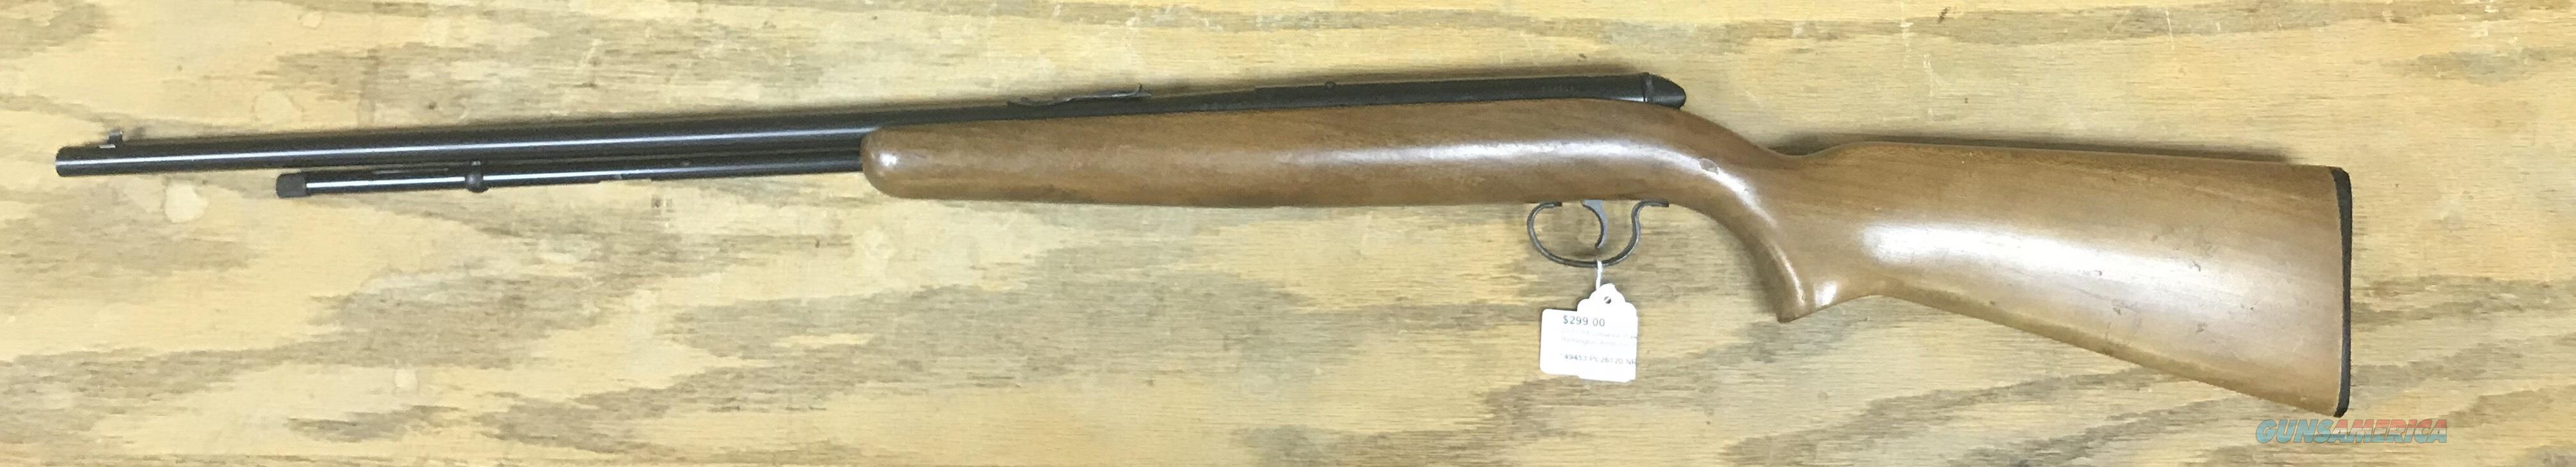 Remington Arms Riffle 550h  Guns > Rifles > Remington Rifles - Modern > .22 Rimfire Models